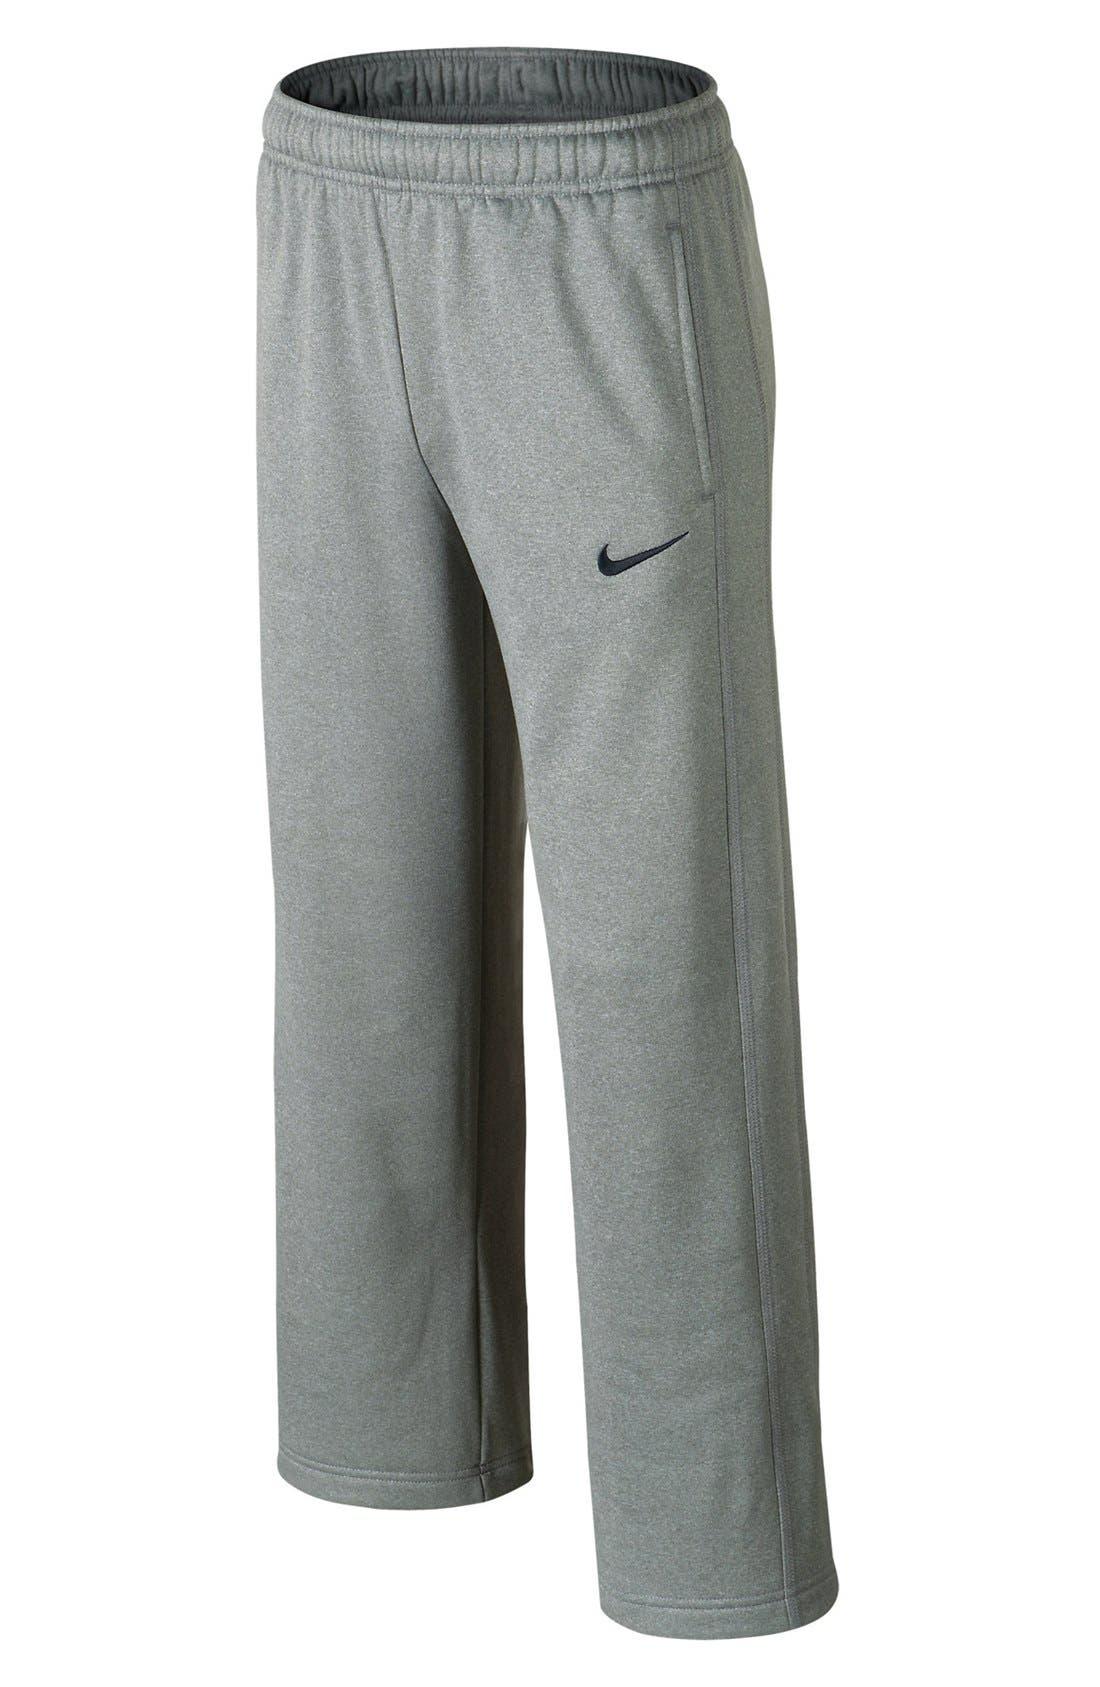 Main Image - Nike 'KO' Fleece Pants (Little Boys & Big Boys)